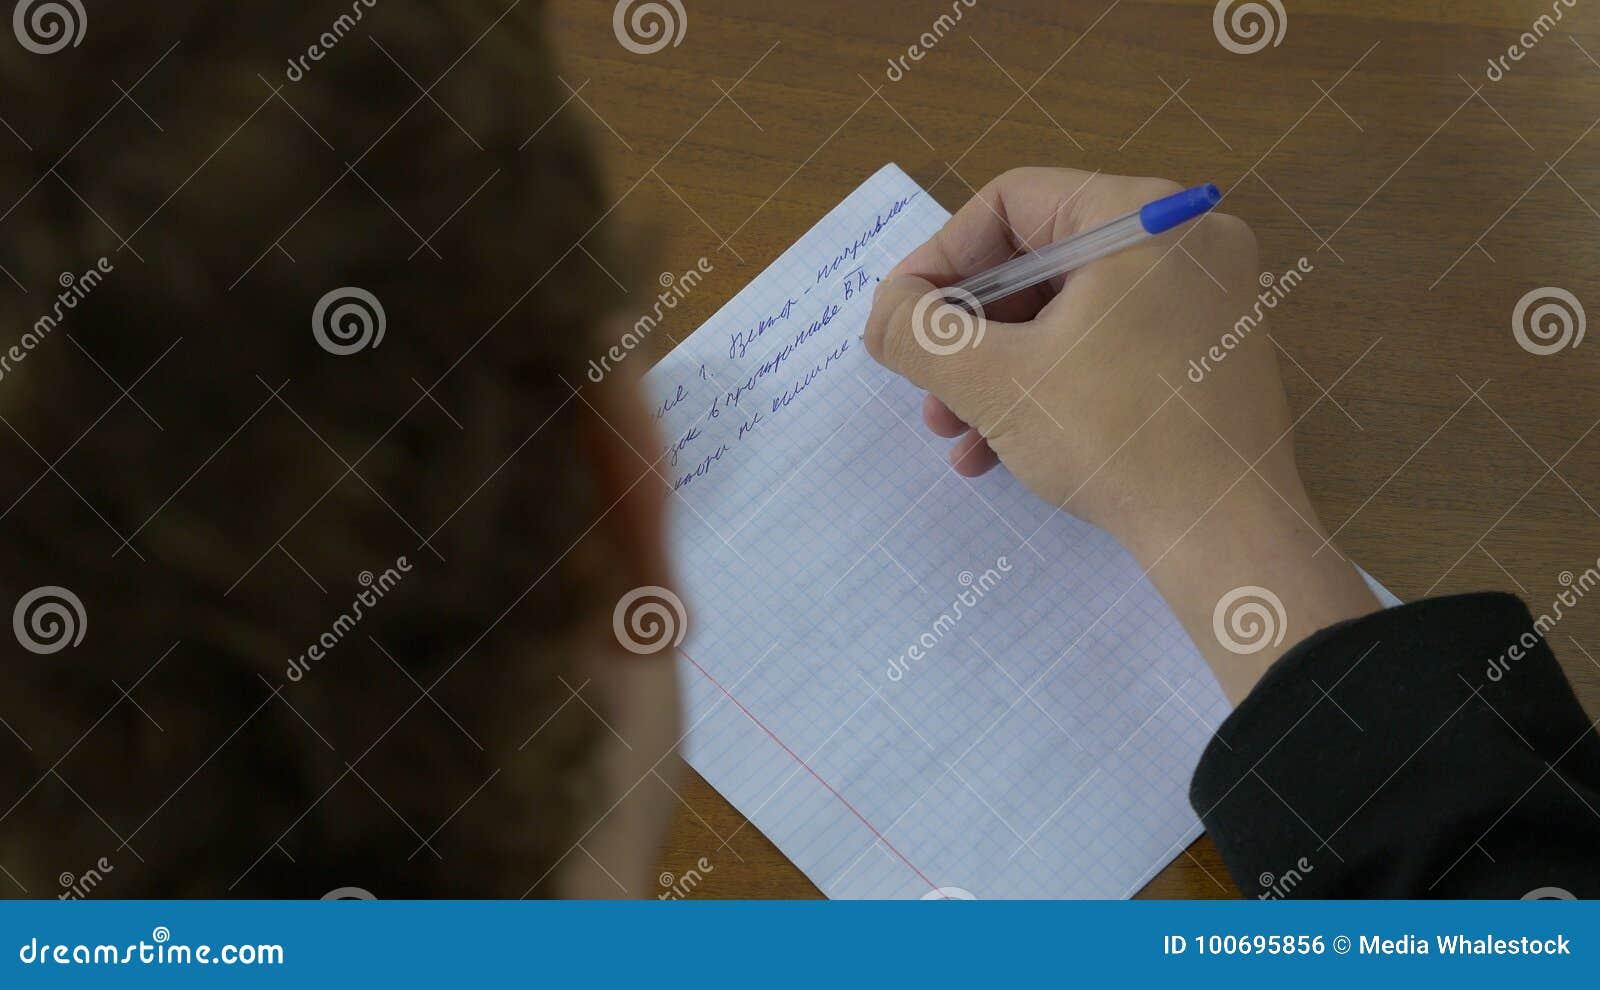 La scrittura, mano scrive una penna su carta L uomo scrive un testo su carta